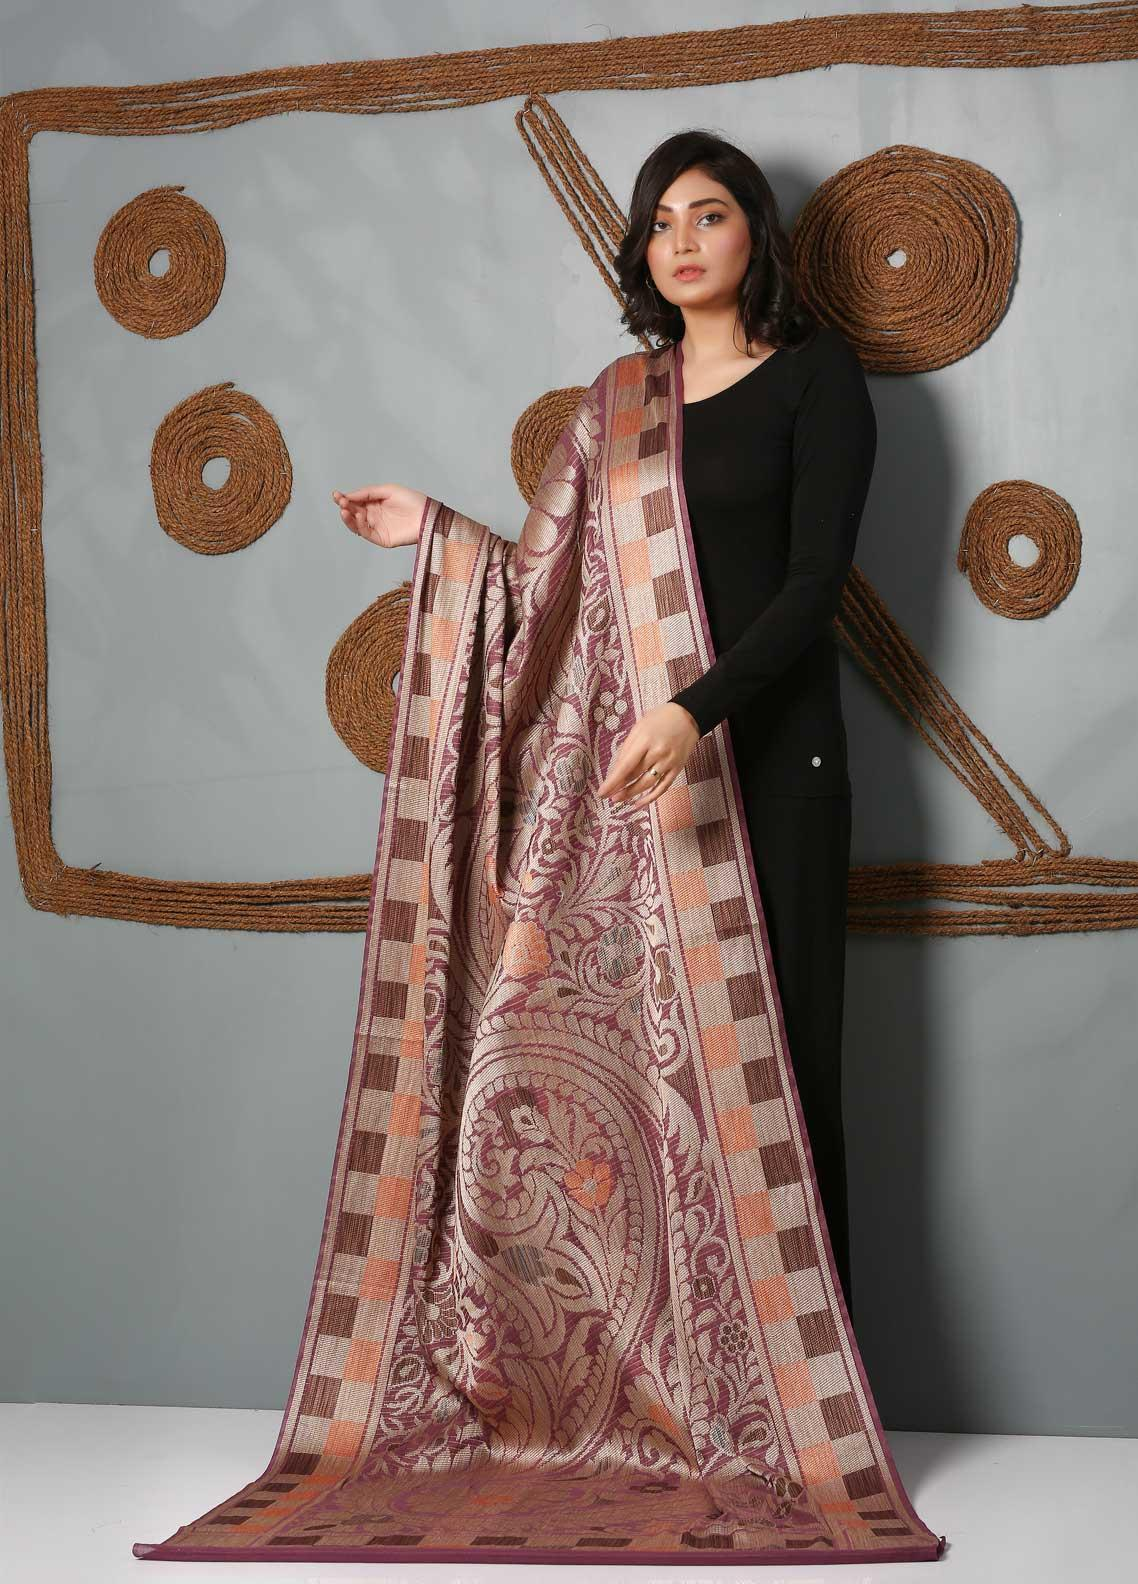 Al Rahim Banarsi Embroidered Banarsi  Shawl AR21BS ALF53 Margenta Pink - Banarsi Shawls